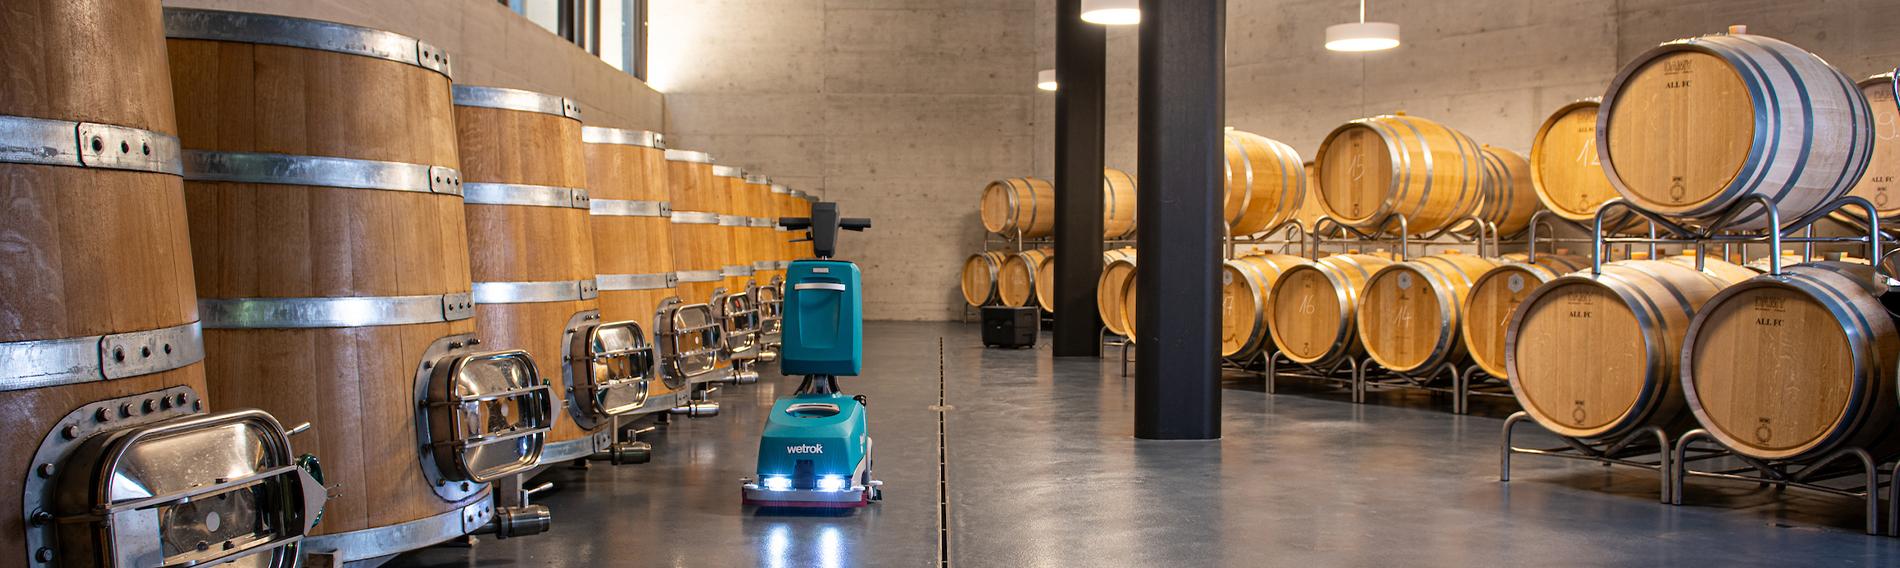 Winemaker tests new scrubber-dryer